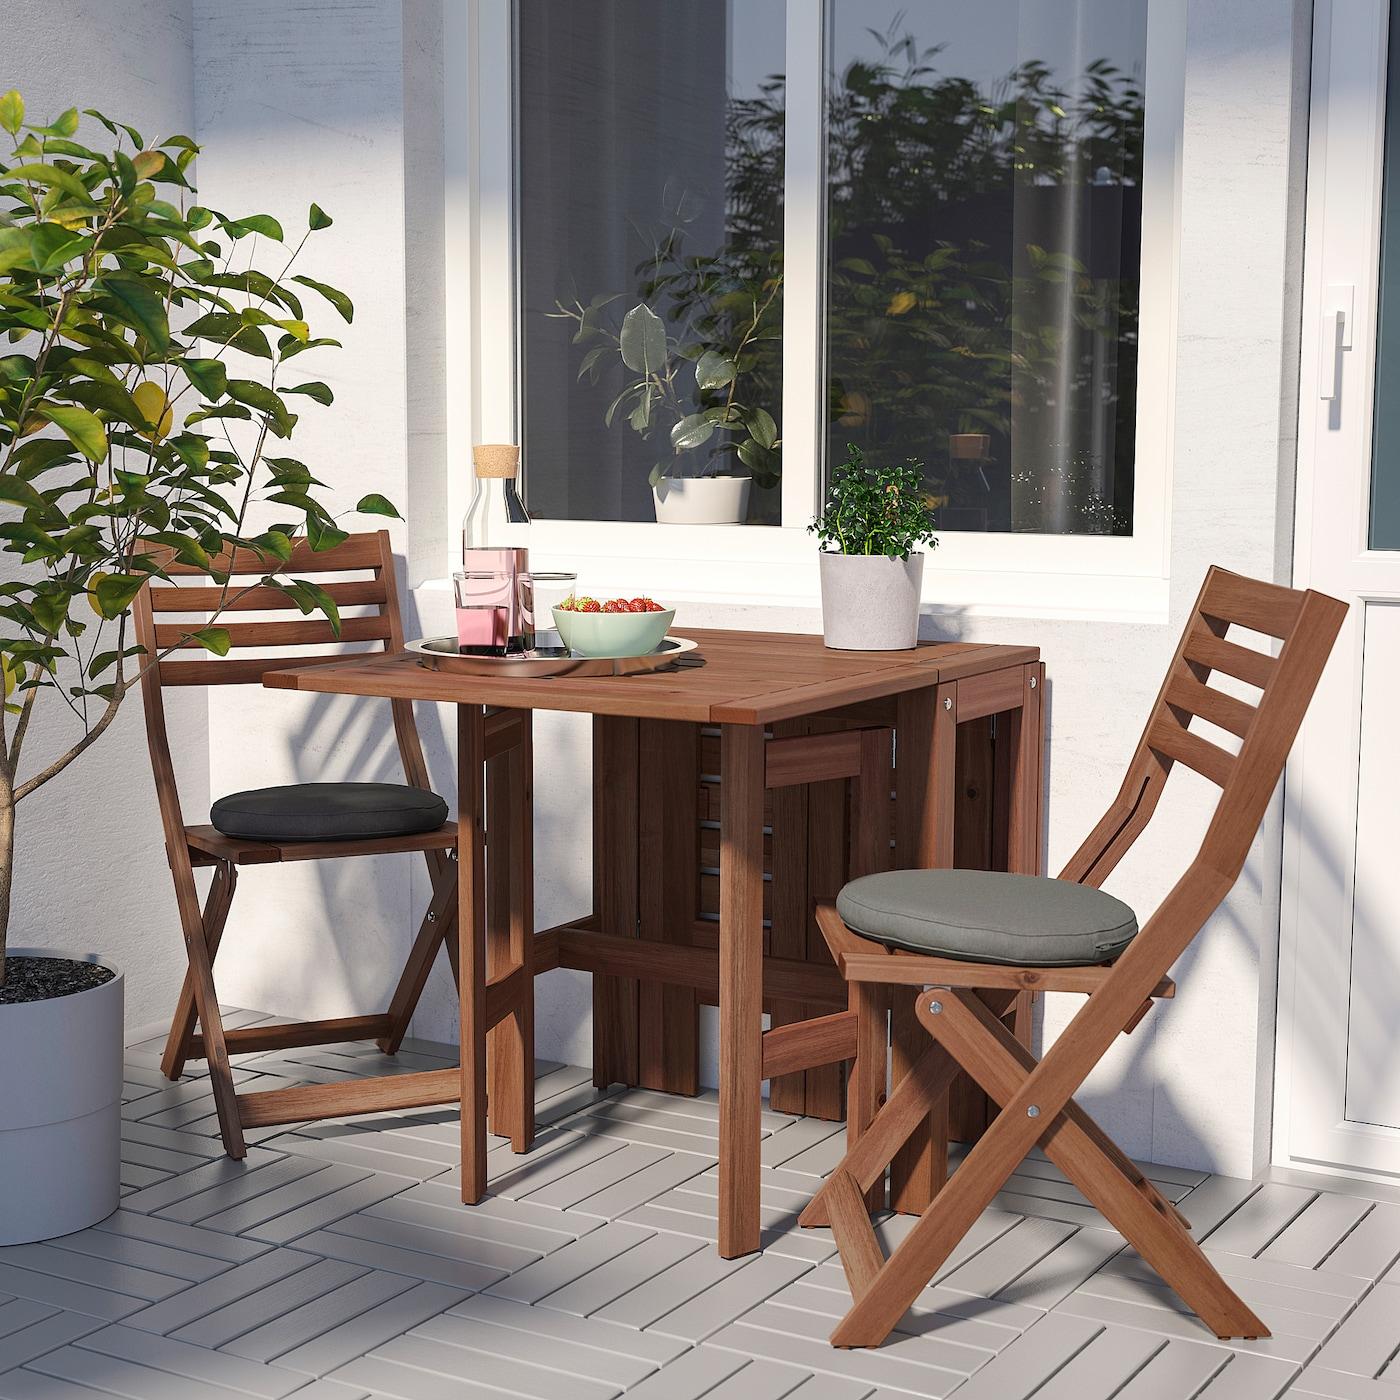 ÄPPLARÖ Gateleg table, outdoor - brown stained 6/6/6x6 cm